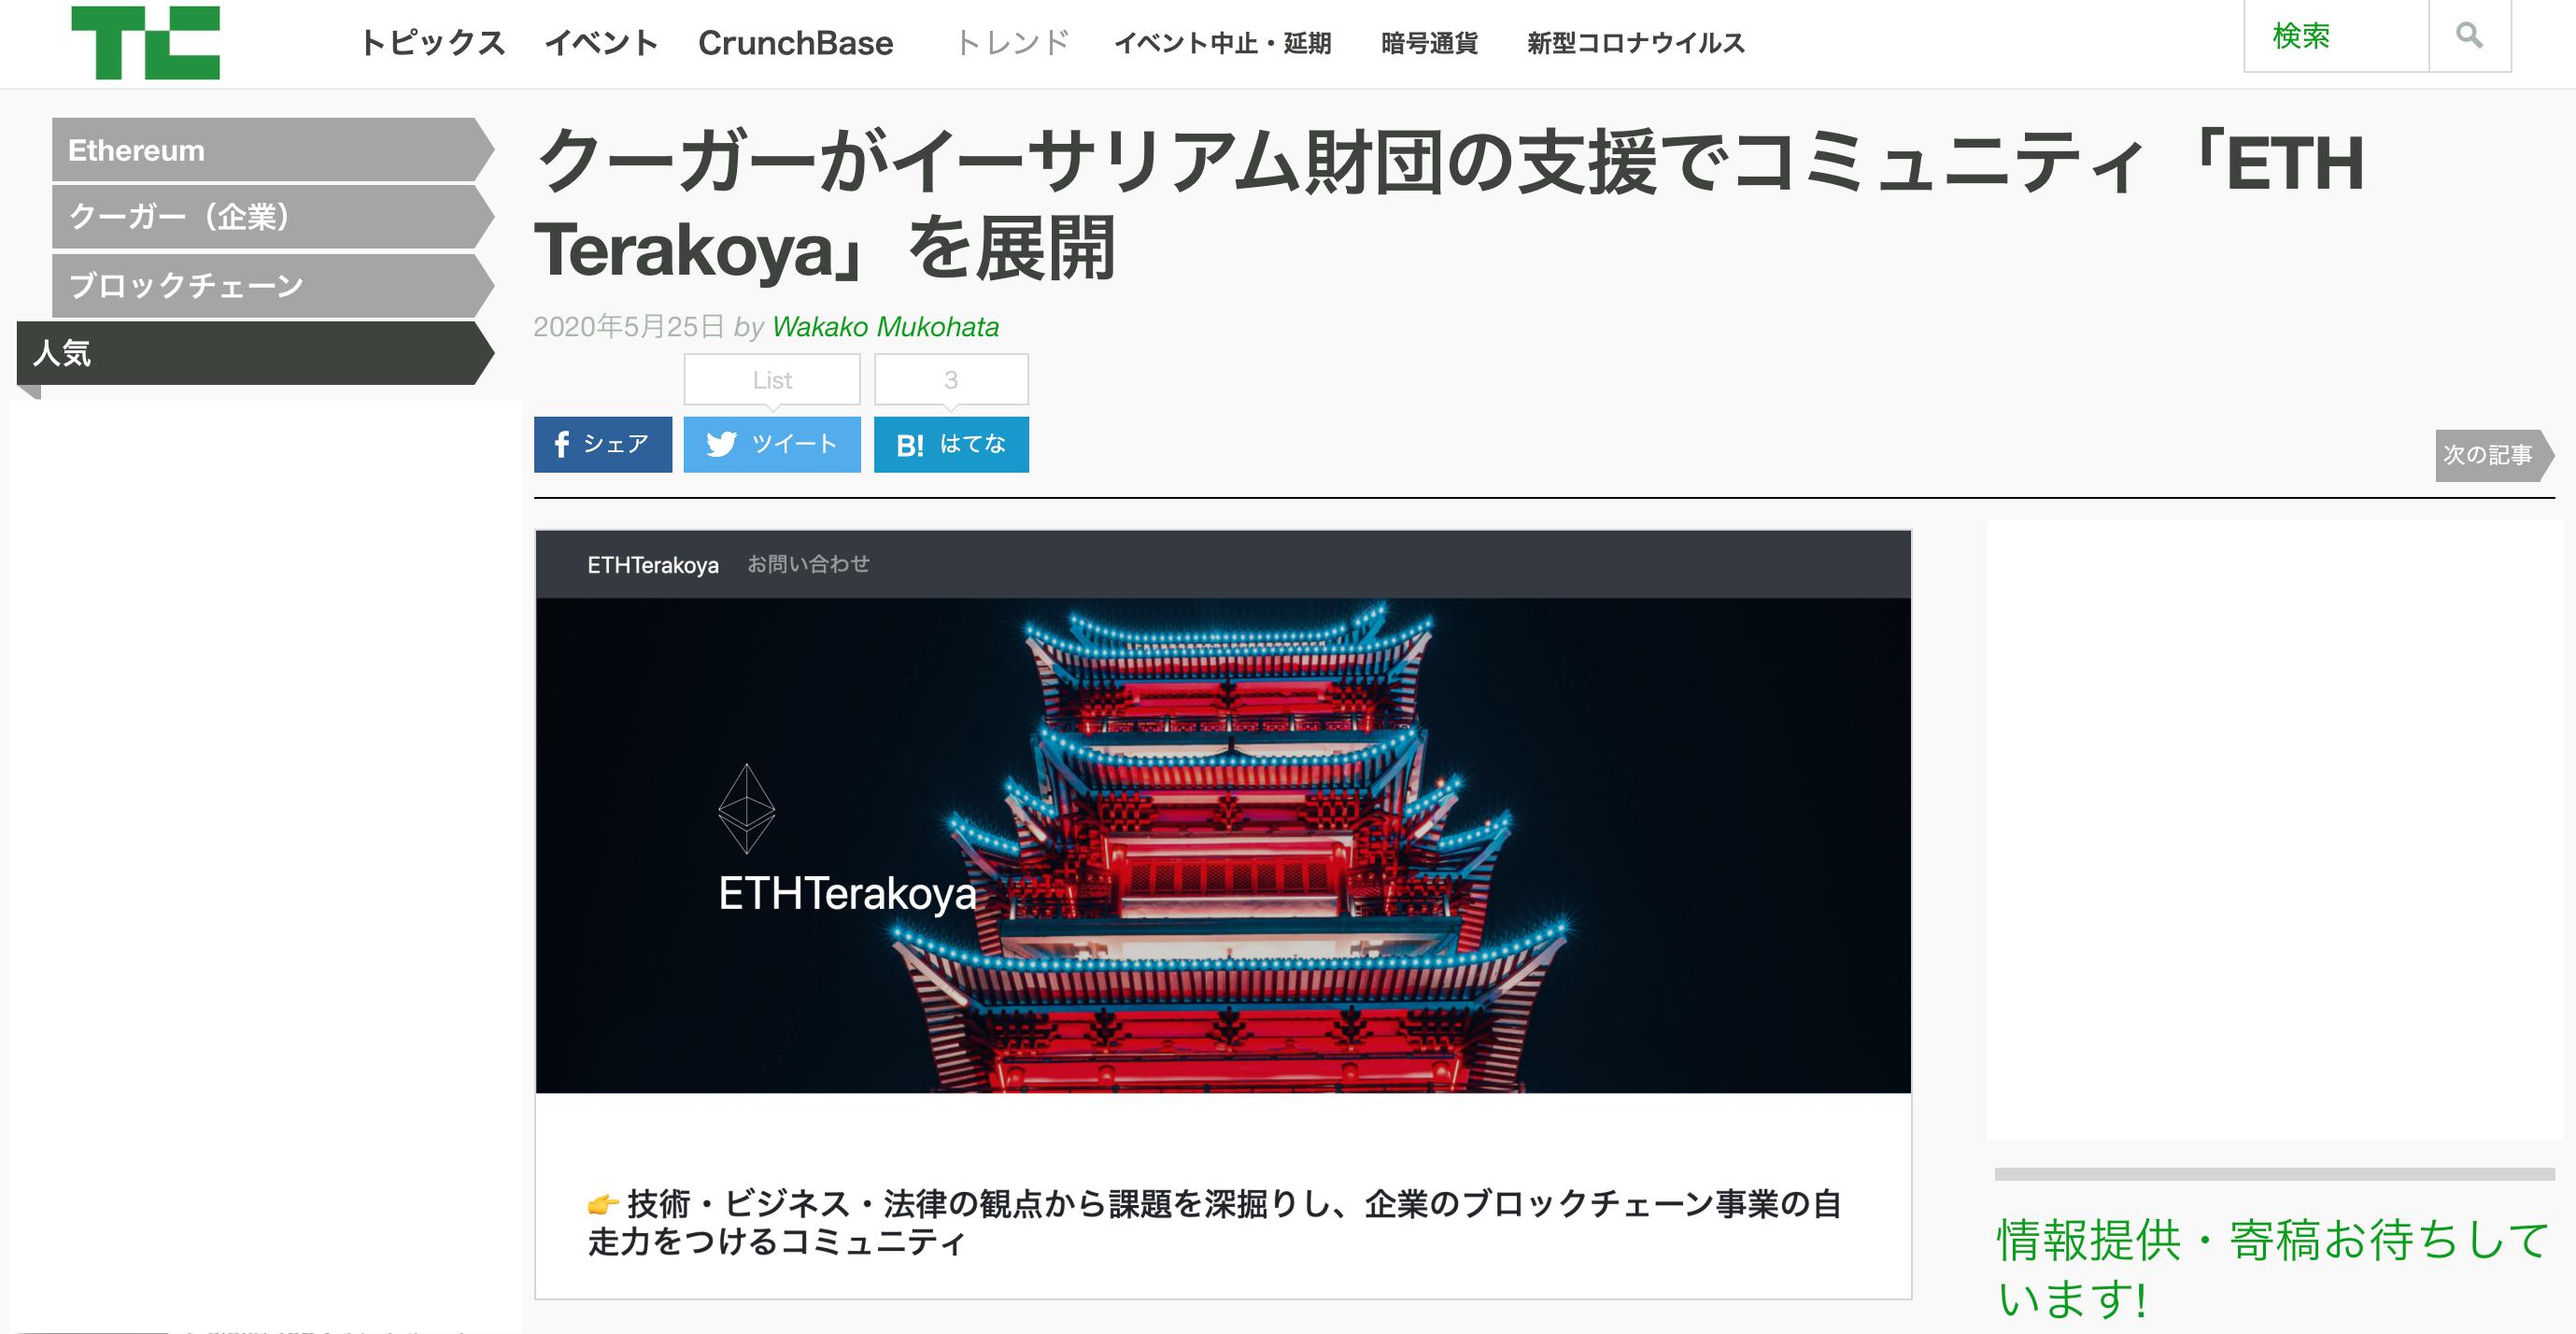 TechCrunchにて、イーサリアム財団の支援で発足したコミュニティ 「ETHTerakoya」について掲載されました